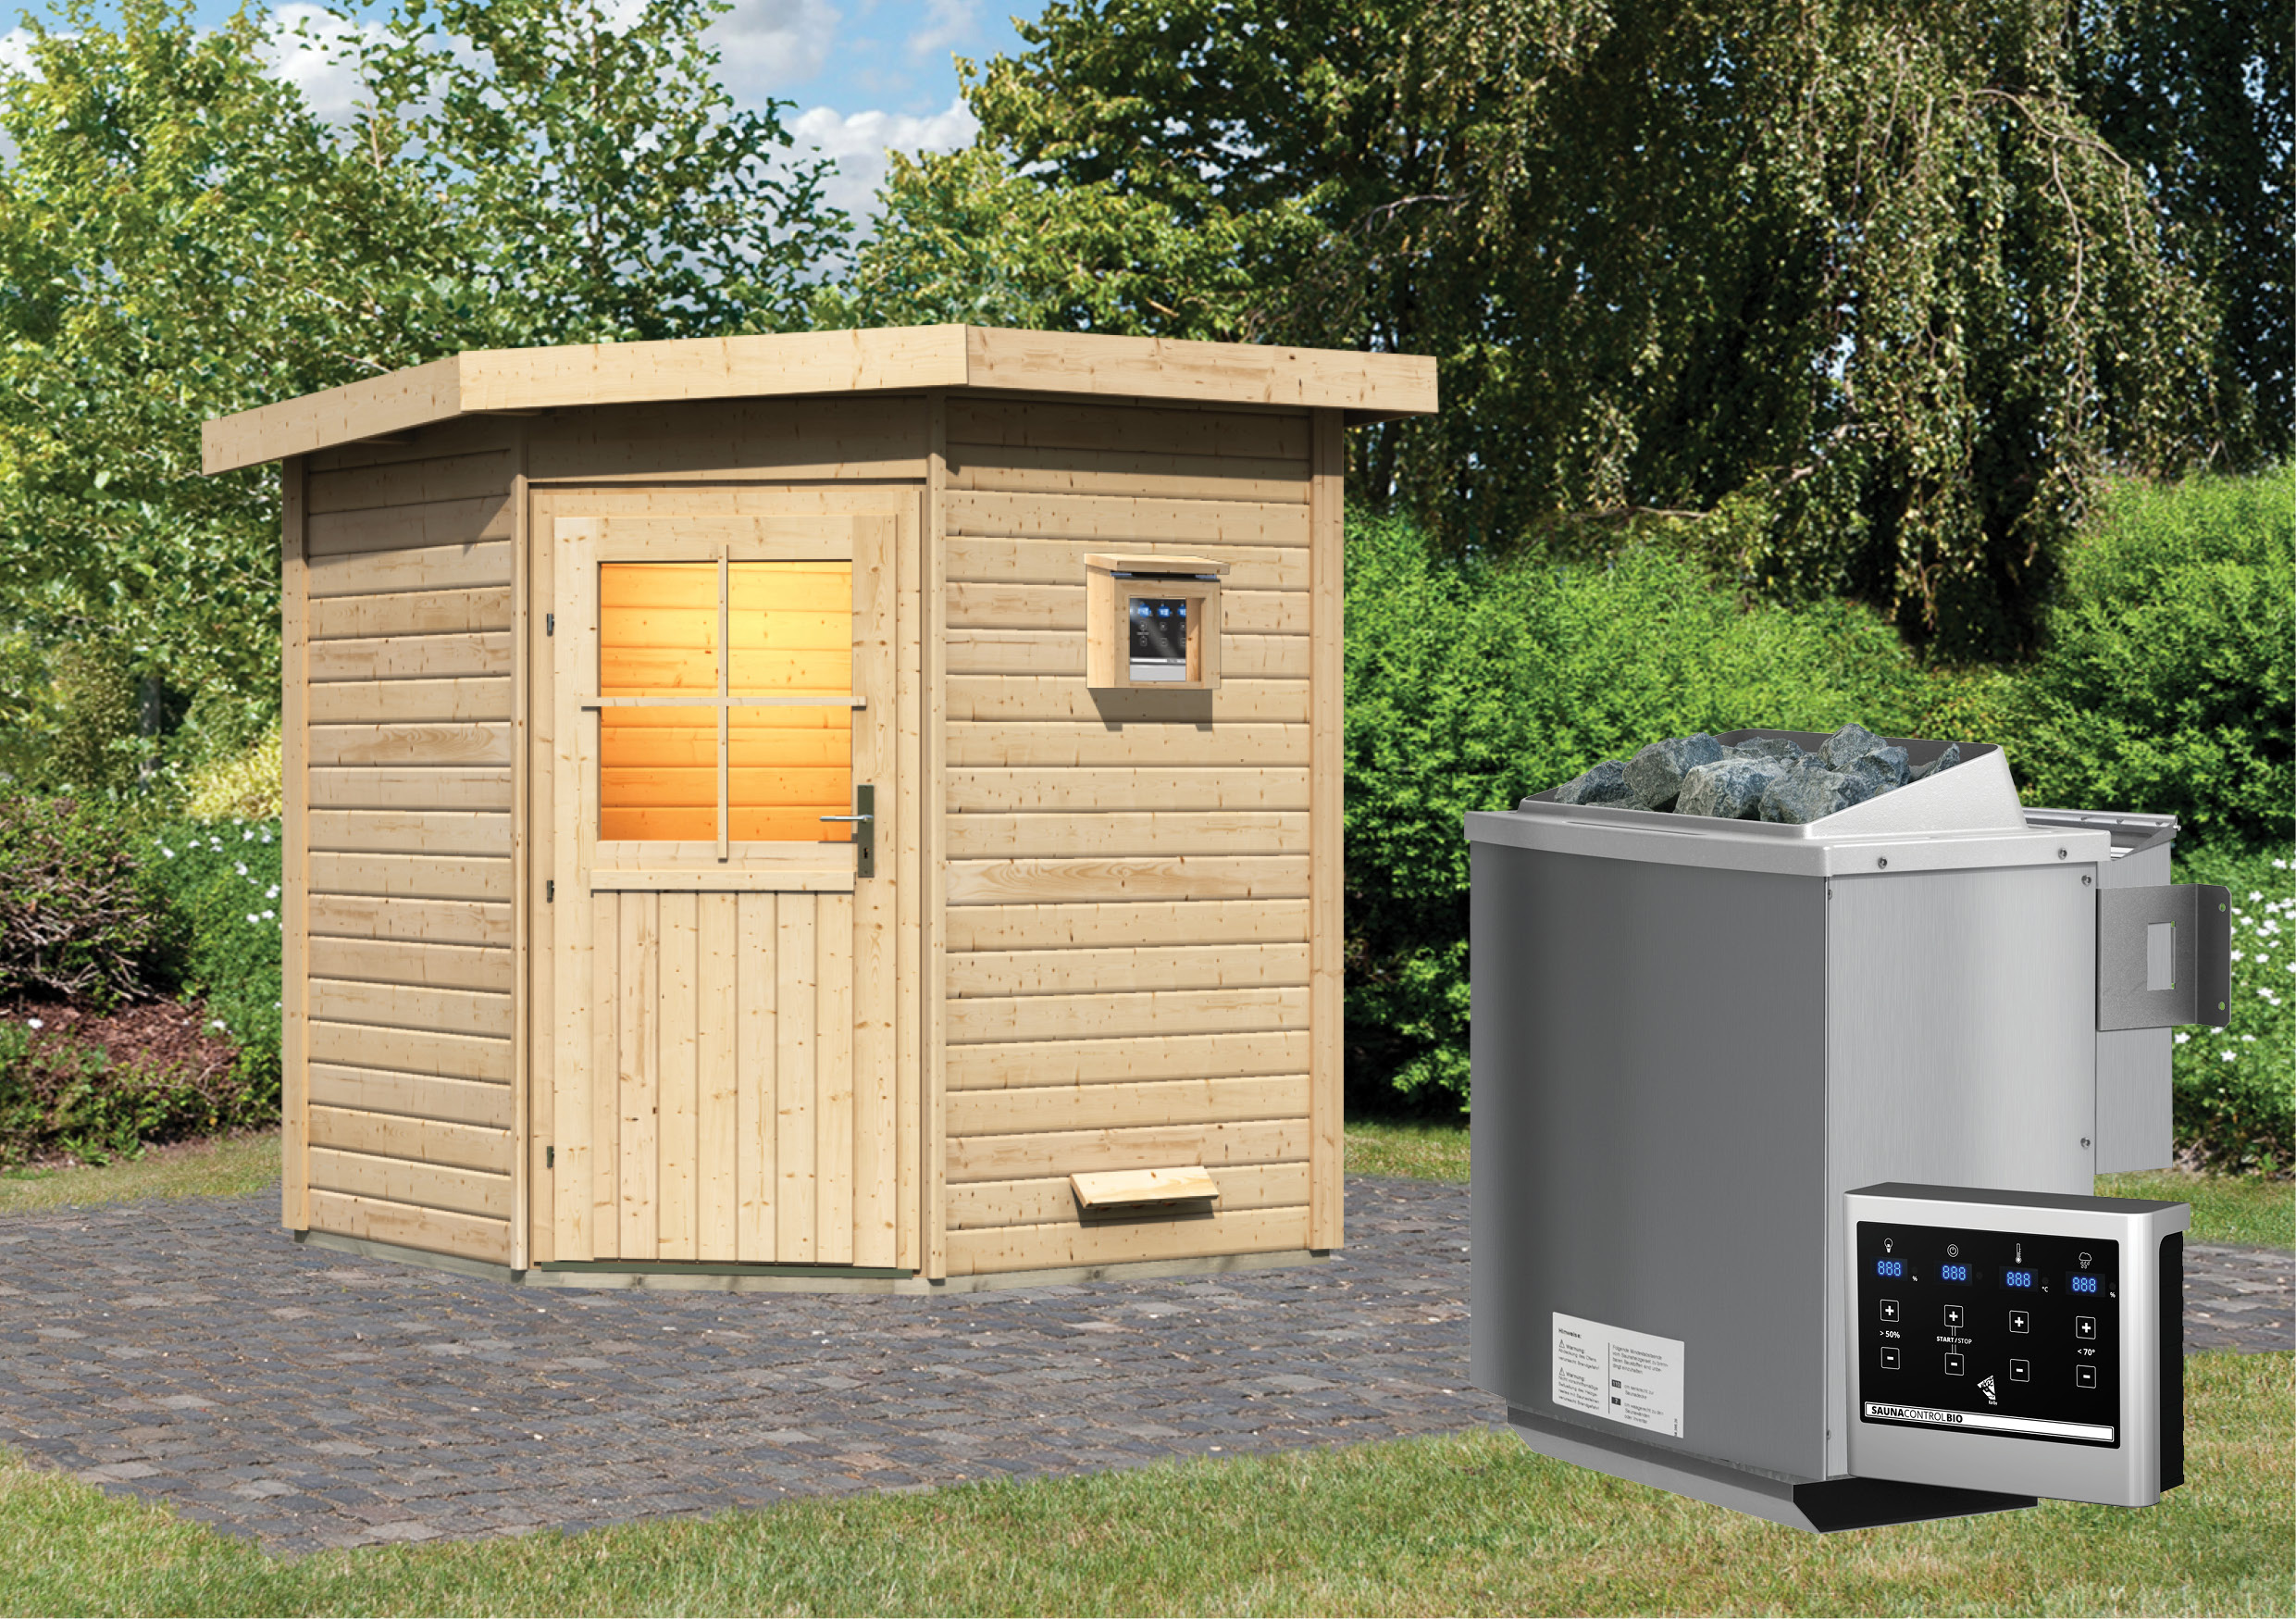 Gartensauna WoodFeeling Saunahaus Pirva 38mm Saunaofen Bio 9kW ext. Bild 1